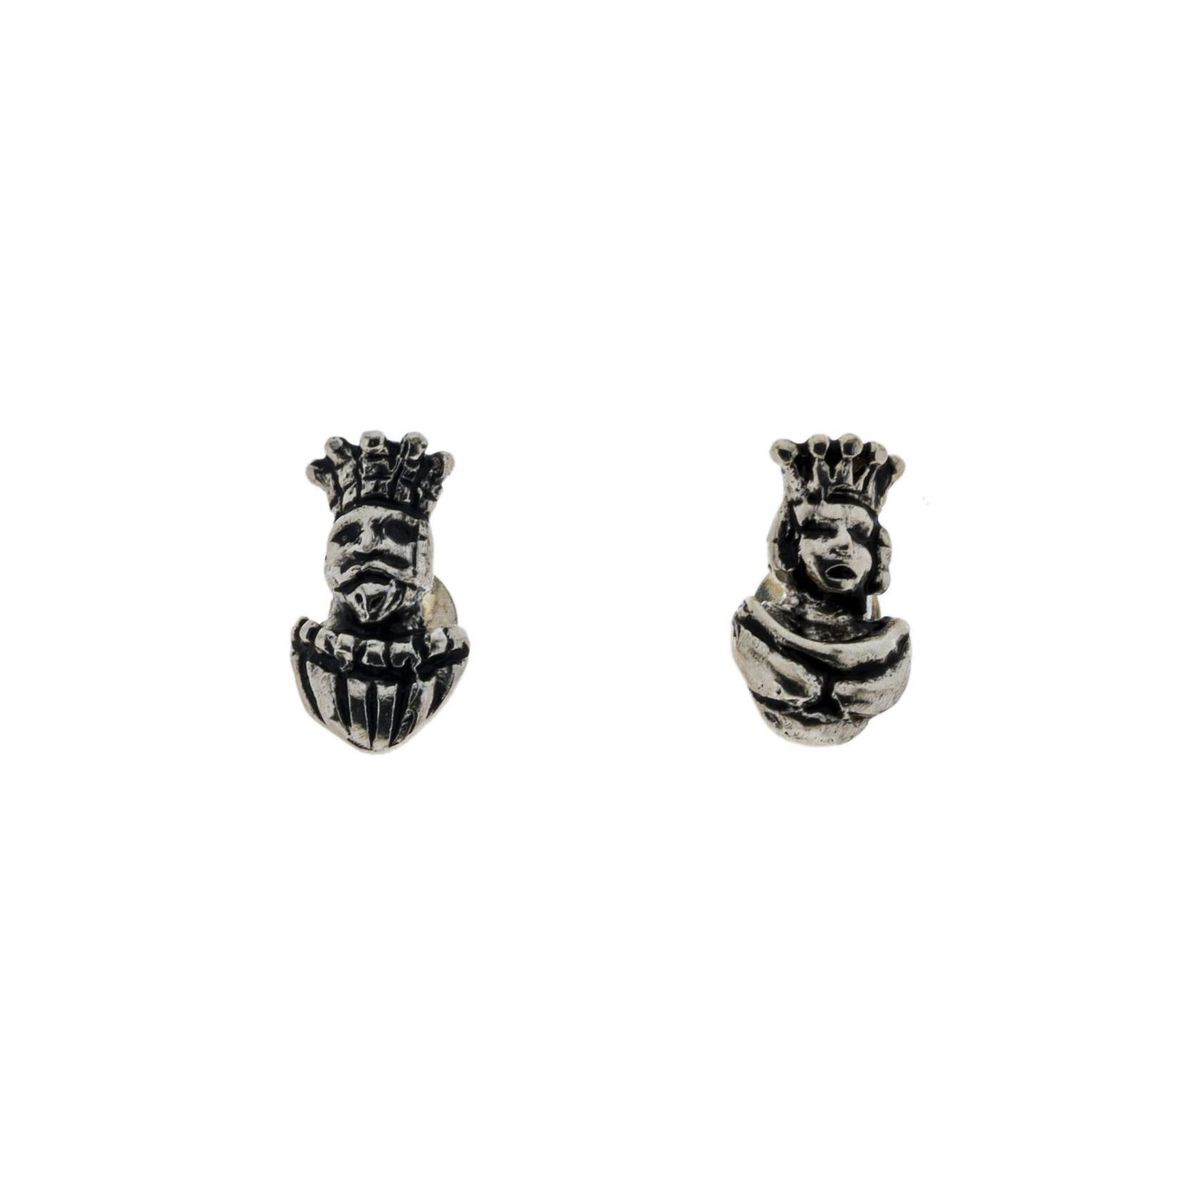 1. Tarot silver earrings J-E205 Silver GIULIANAdiFRANCO